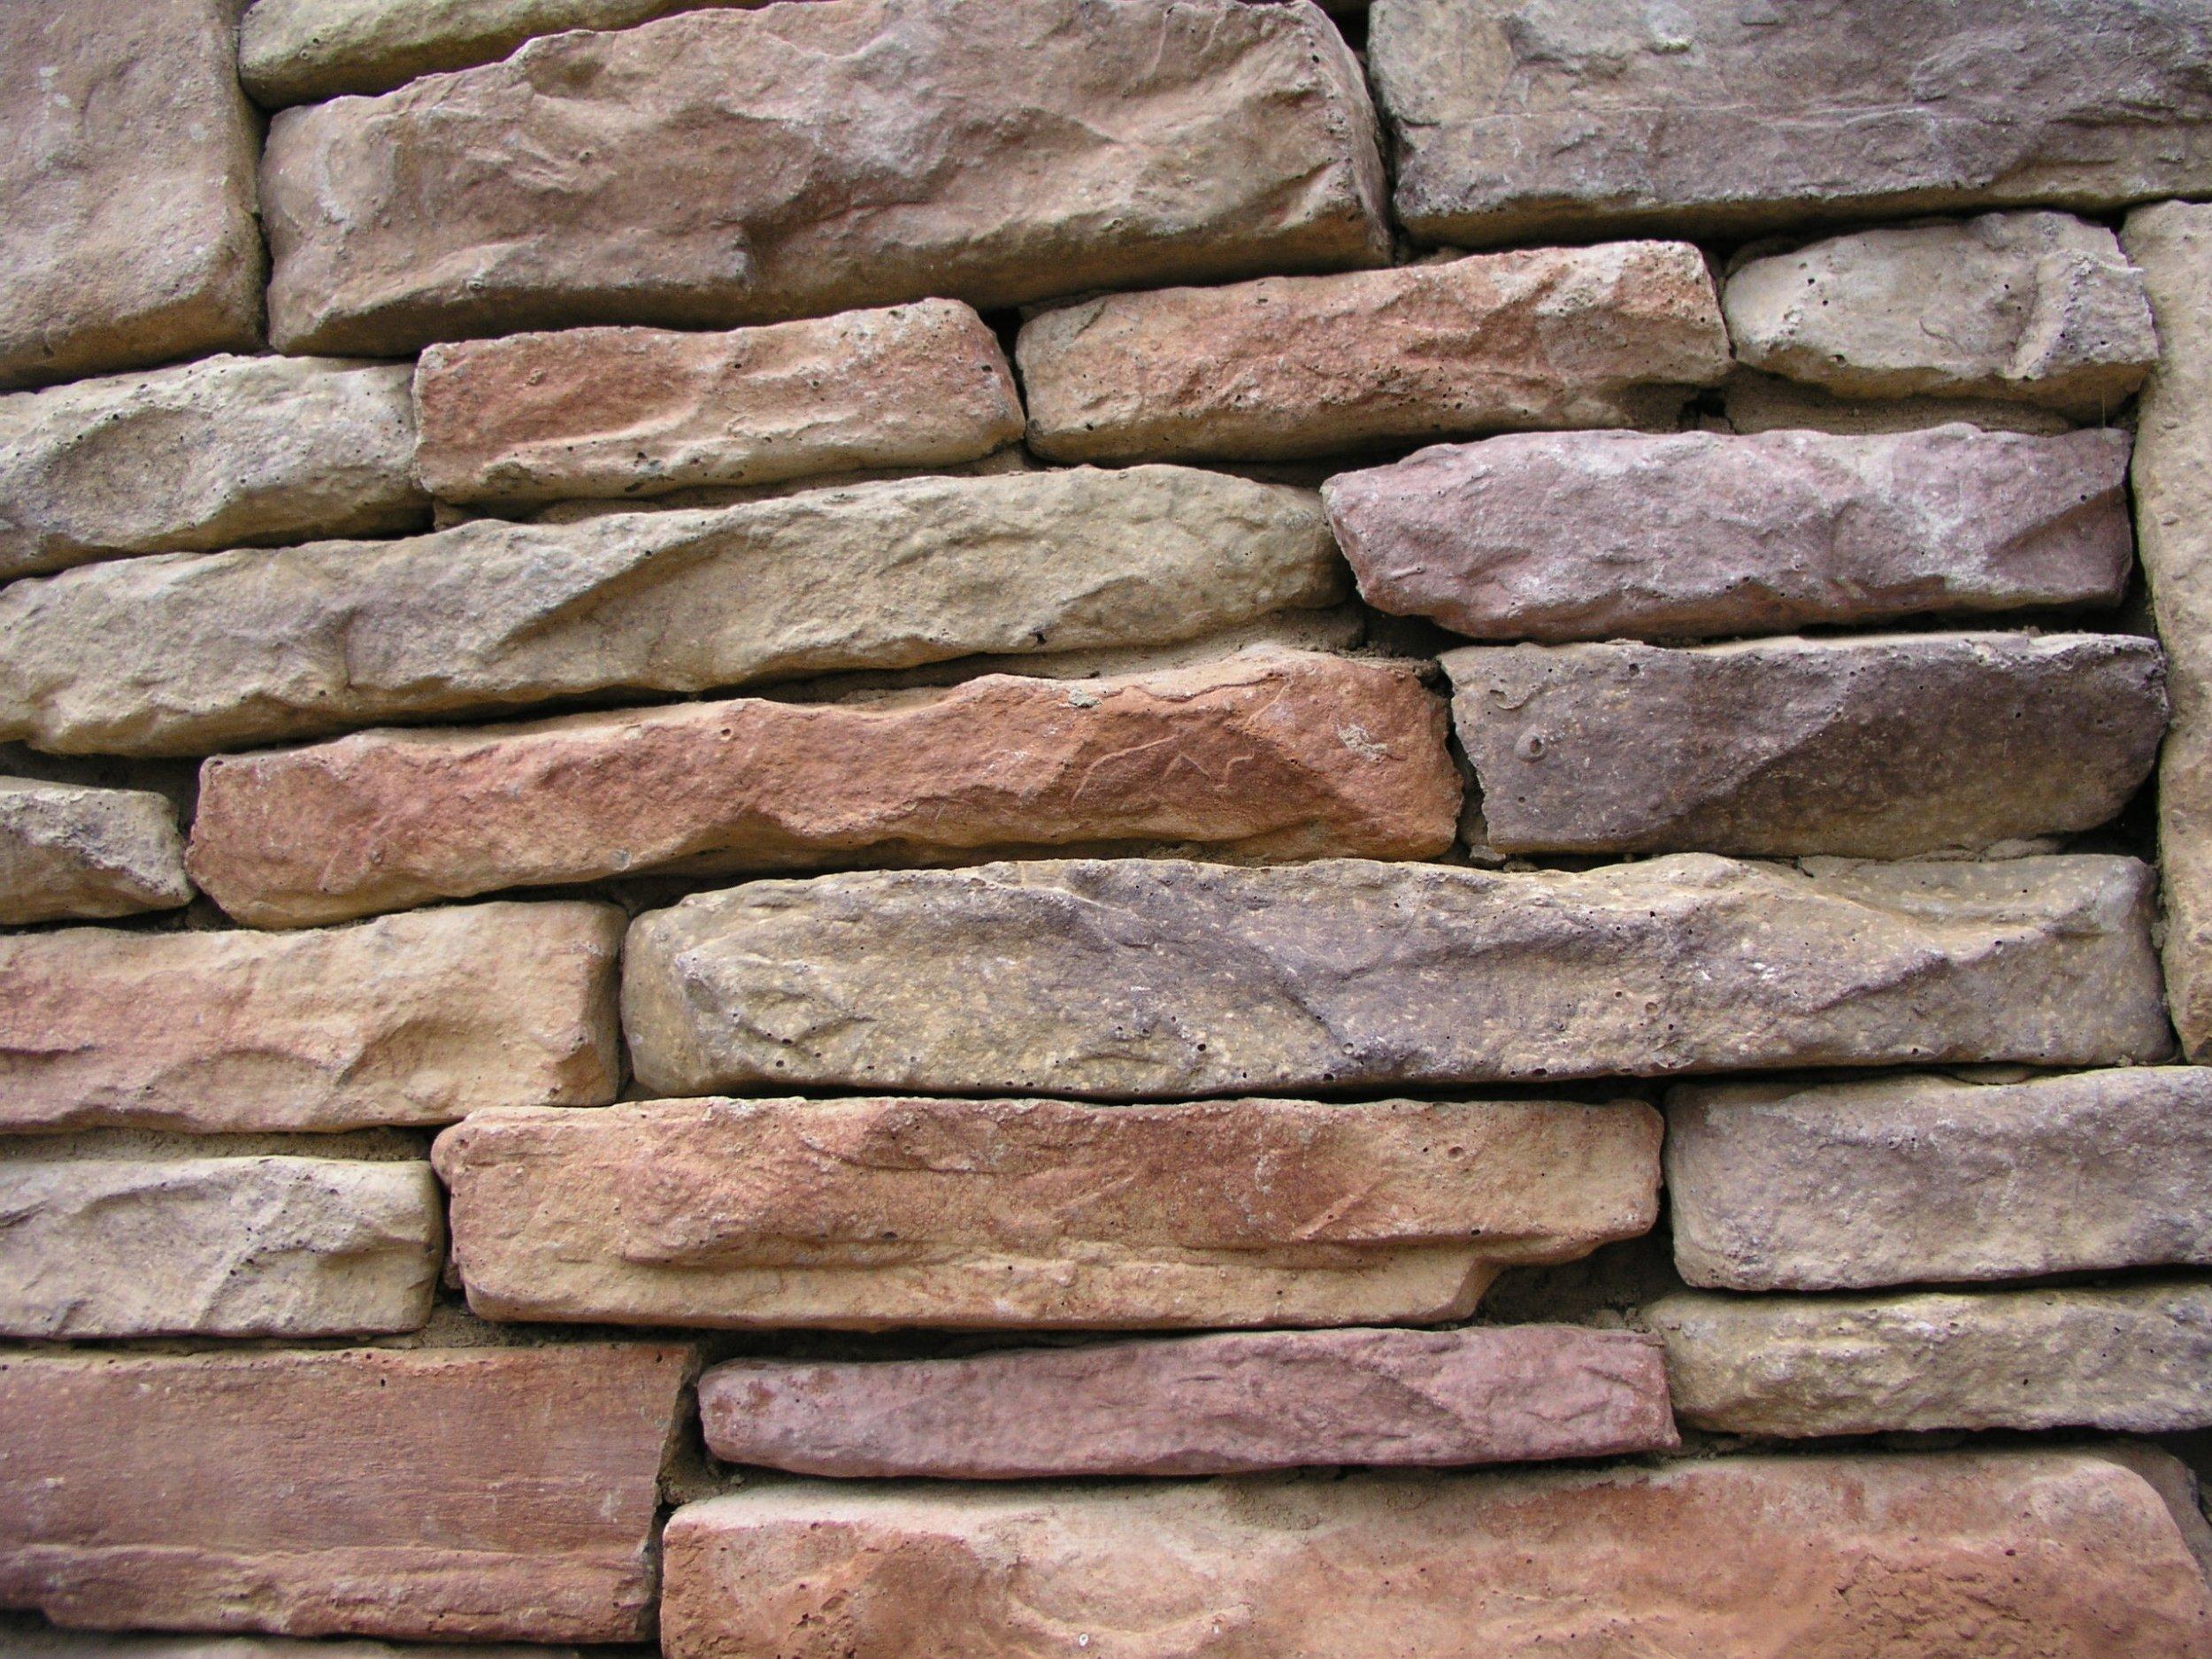 1 Set of 86 Molds to Make Drystack Ledgestone Rock, ODL-86